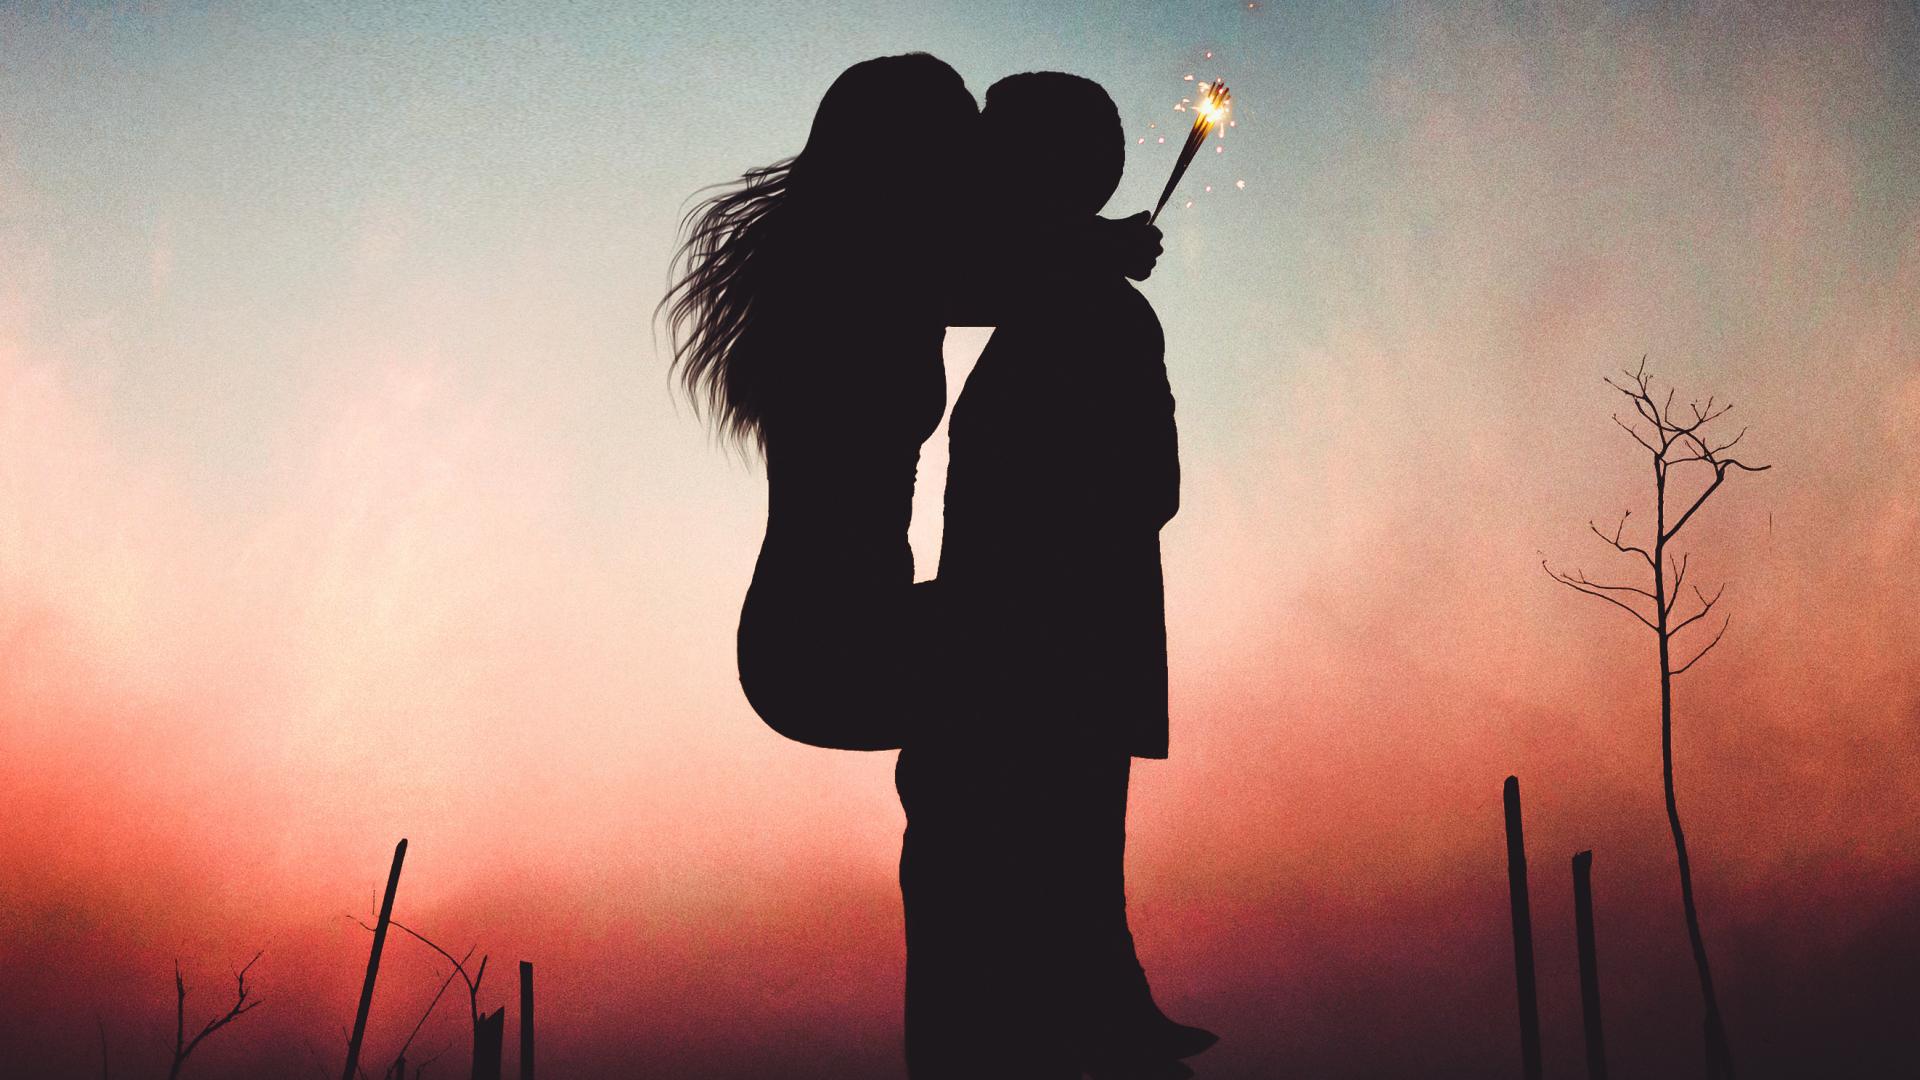 88 Romantic Couple Wallpaper Hd 1080p Terbaru